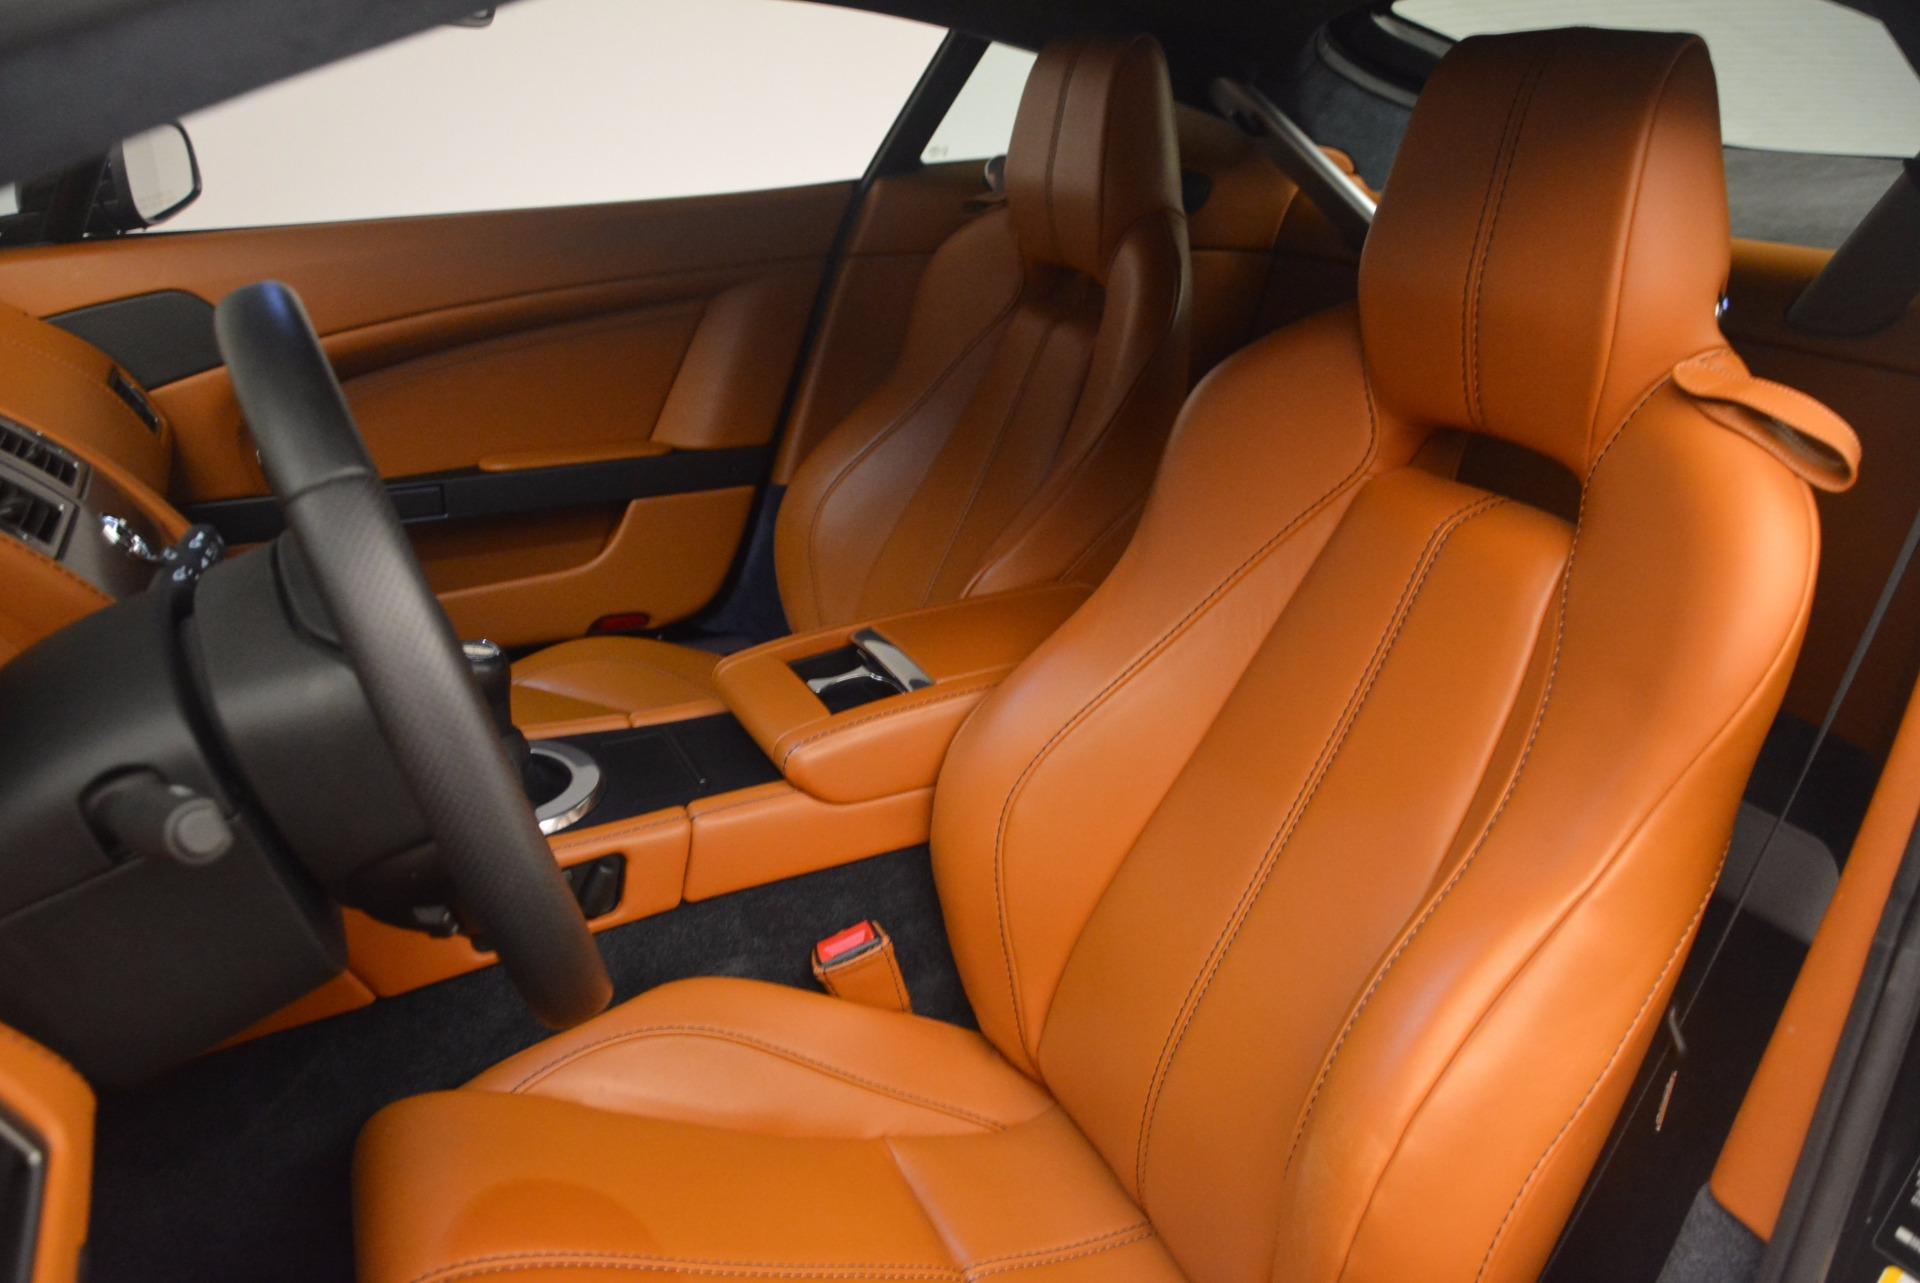 Used 2009 Aston Martin V8 Vantage  For Sale In Greenwich, CT 1183_p14